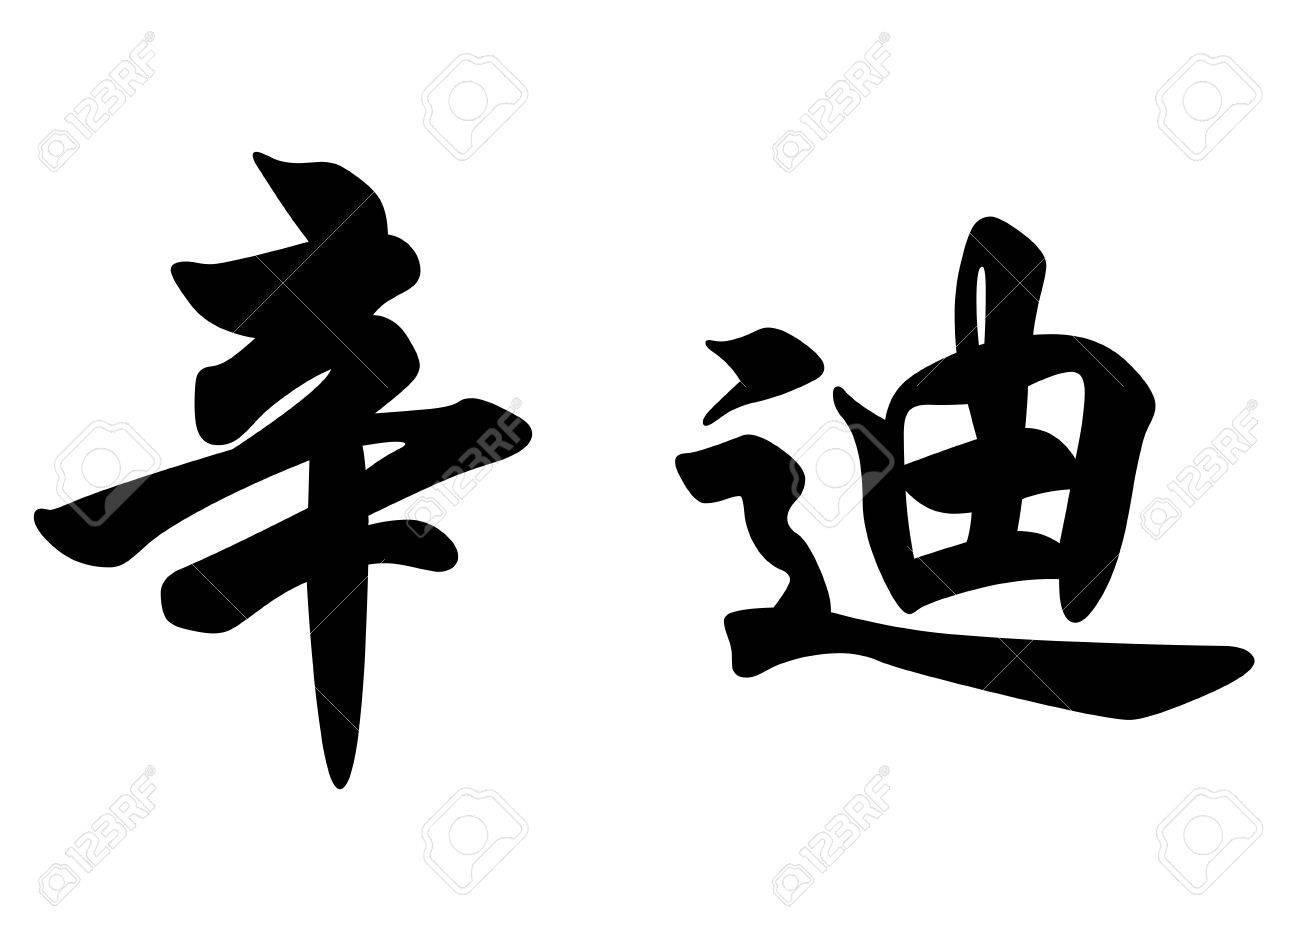 English name cindie or cindy in chinese kanji calligraphy characters english name cindie or cindy in chinese kanji calligraphy characters or japanese characters stock photo biocorpaavc Choice Image